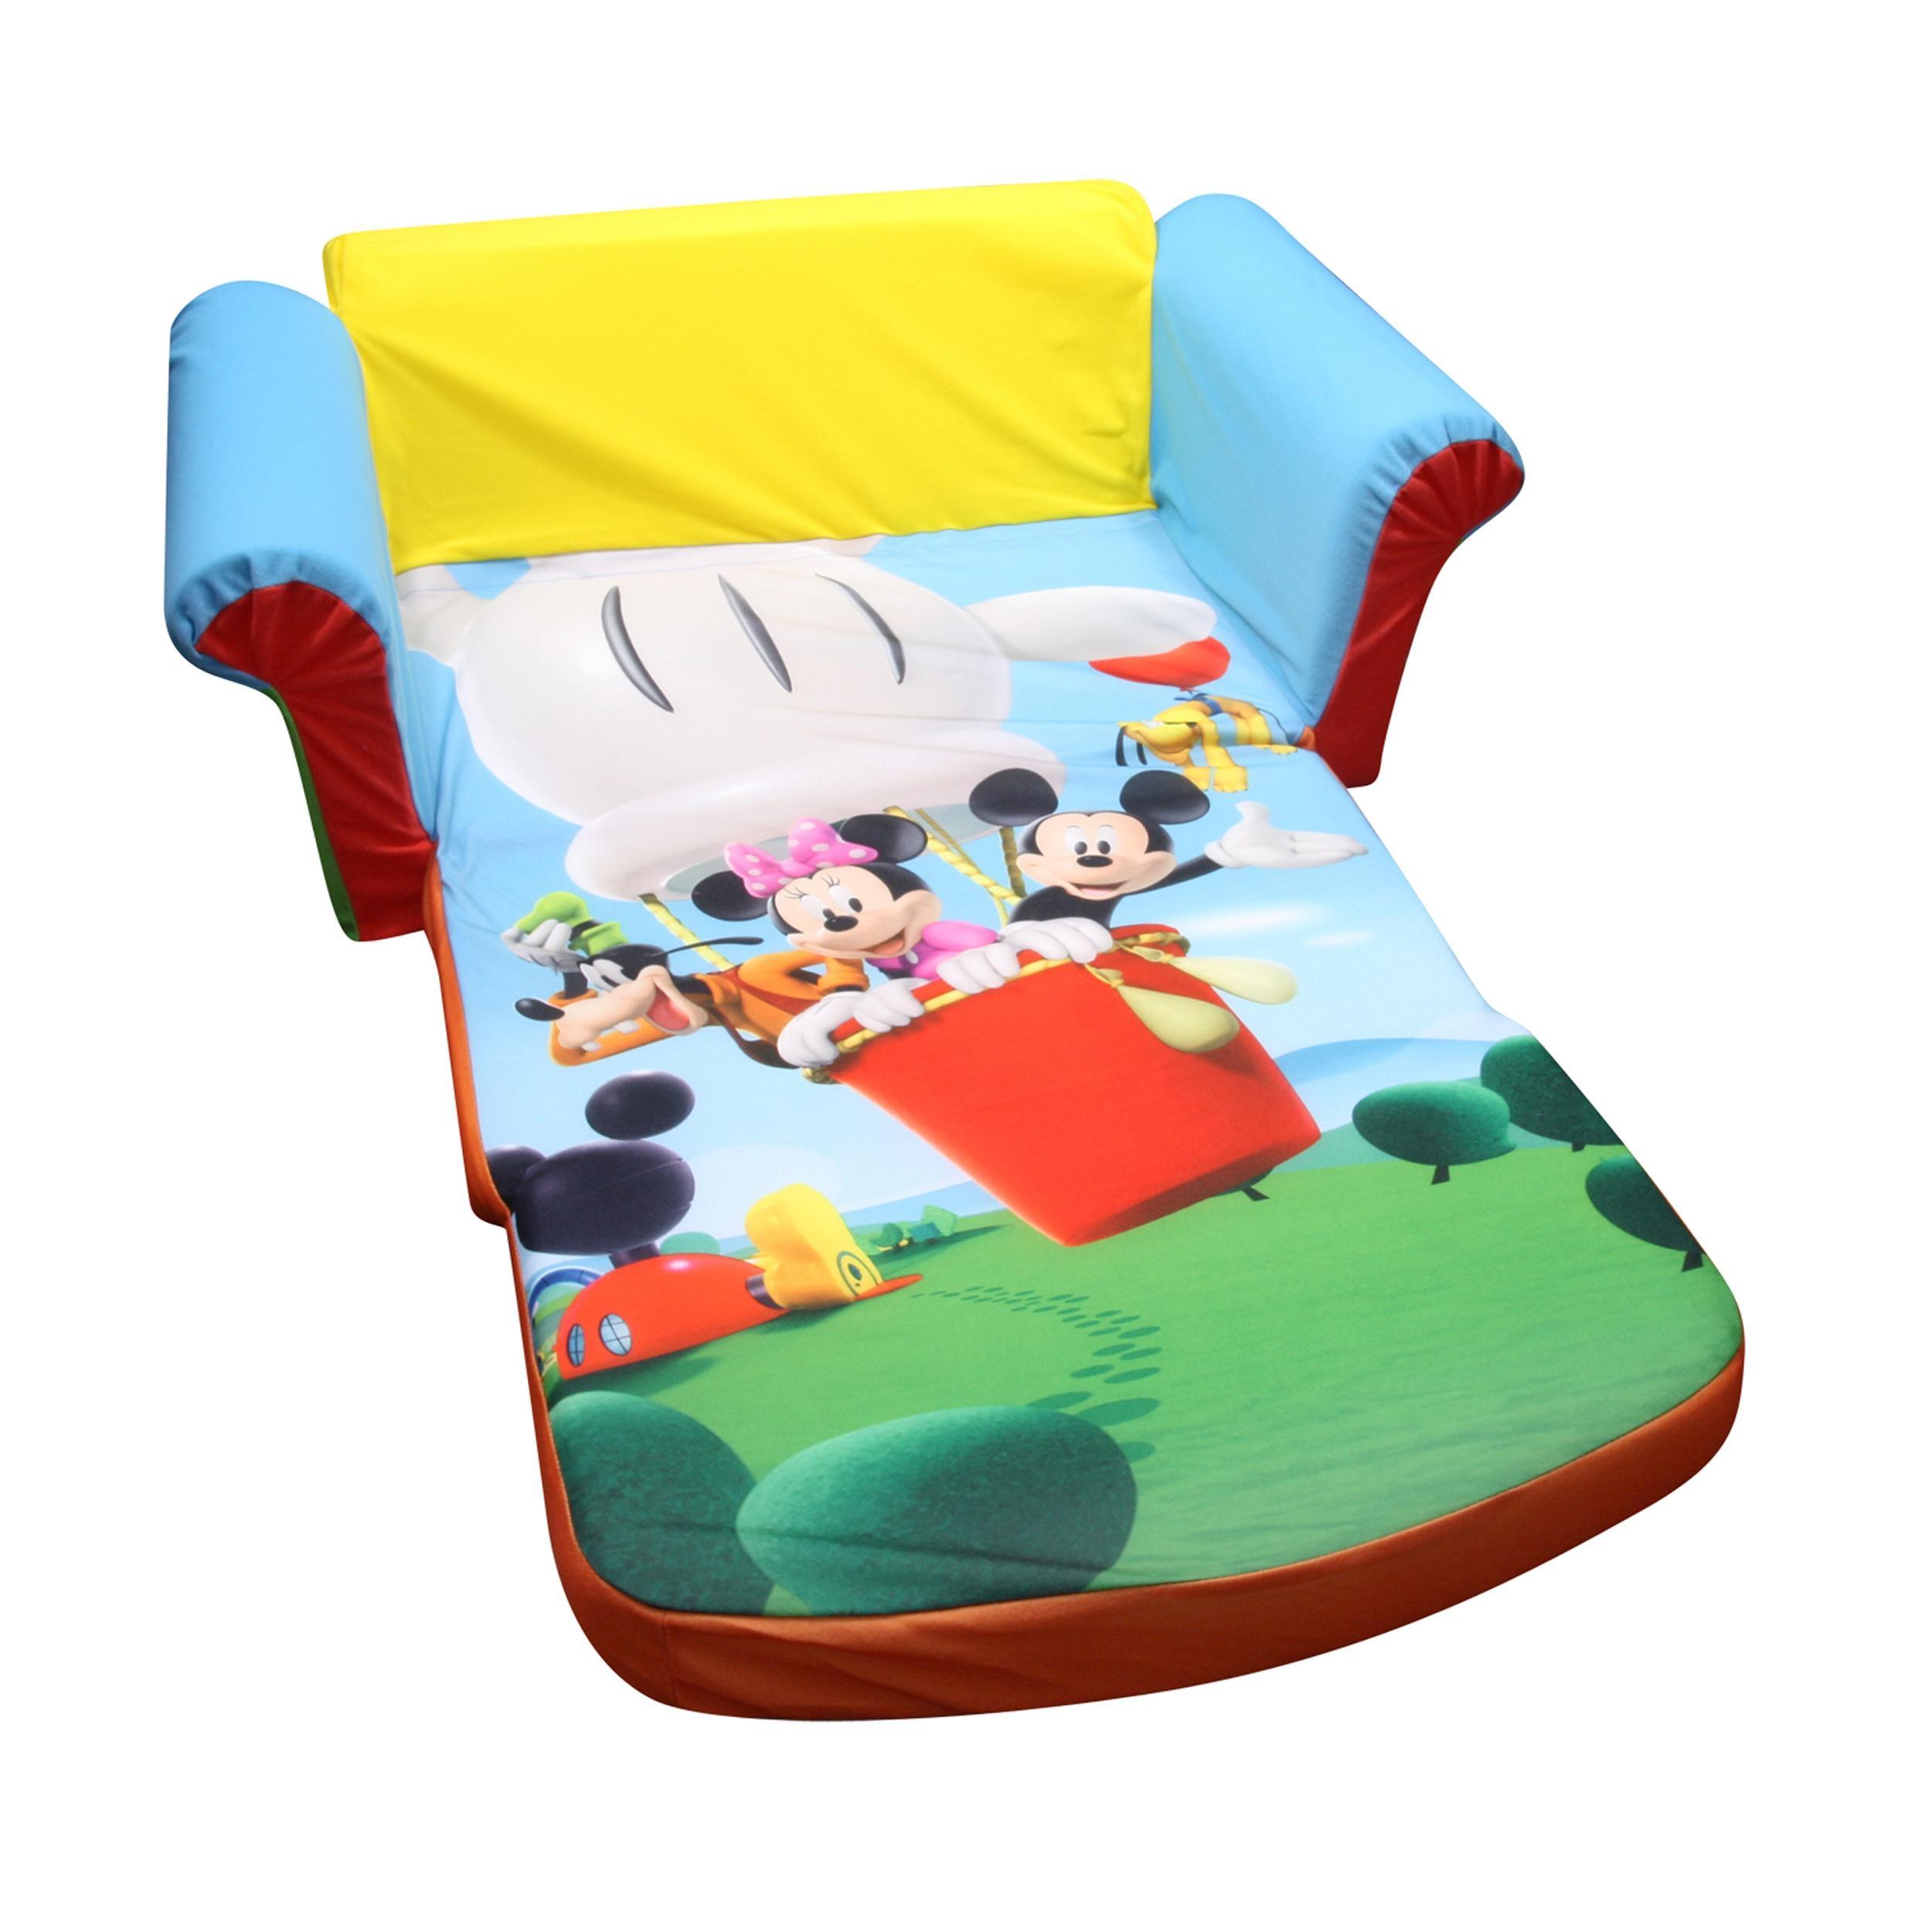 Marshmallow Furniture, Children's 2 In 1 Flip Open Foam Sofa Regarding Mickey Flip Sofas (Image 5 of 20)